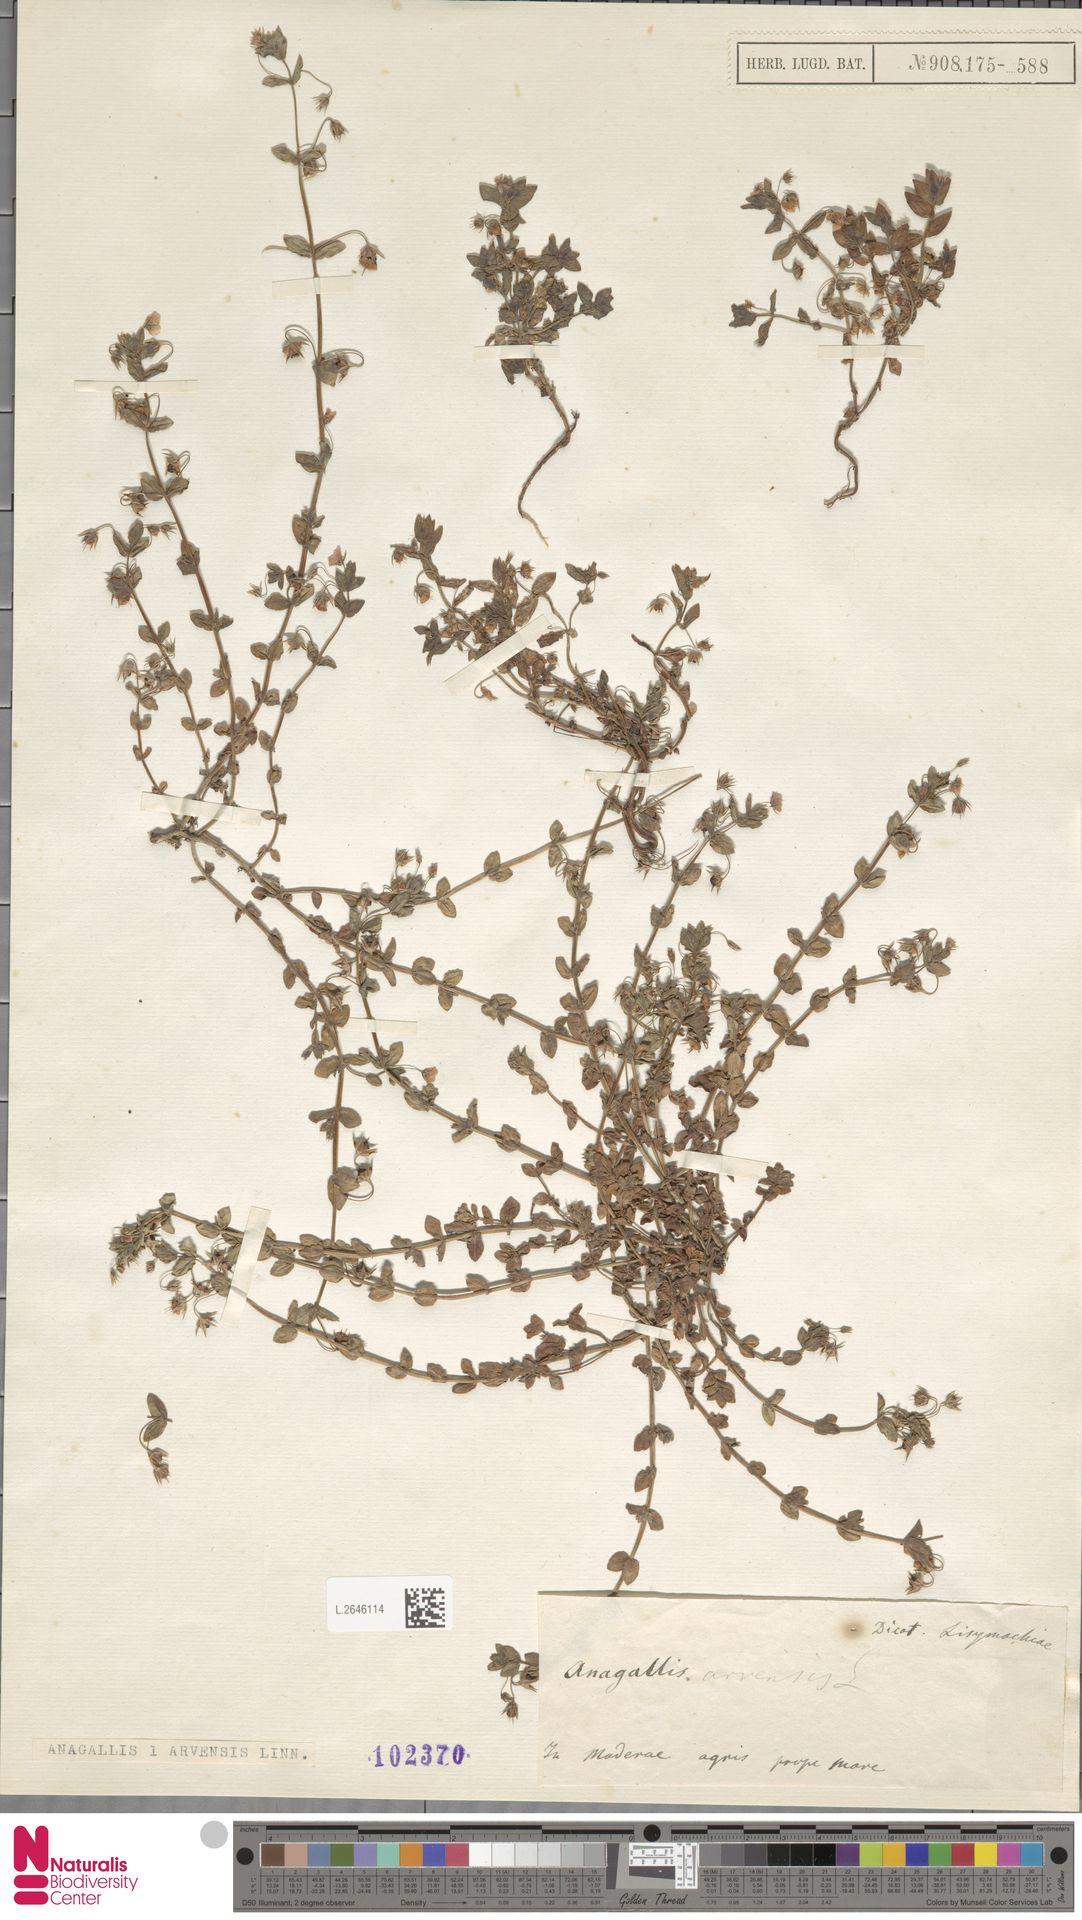 L.2646114 | Anagallis arvensis L.